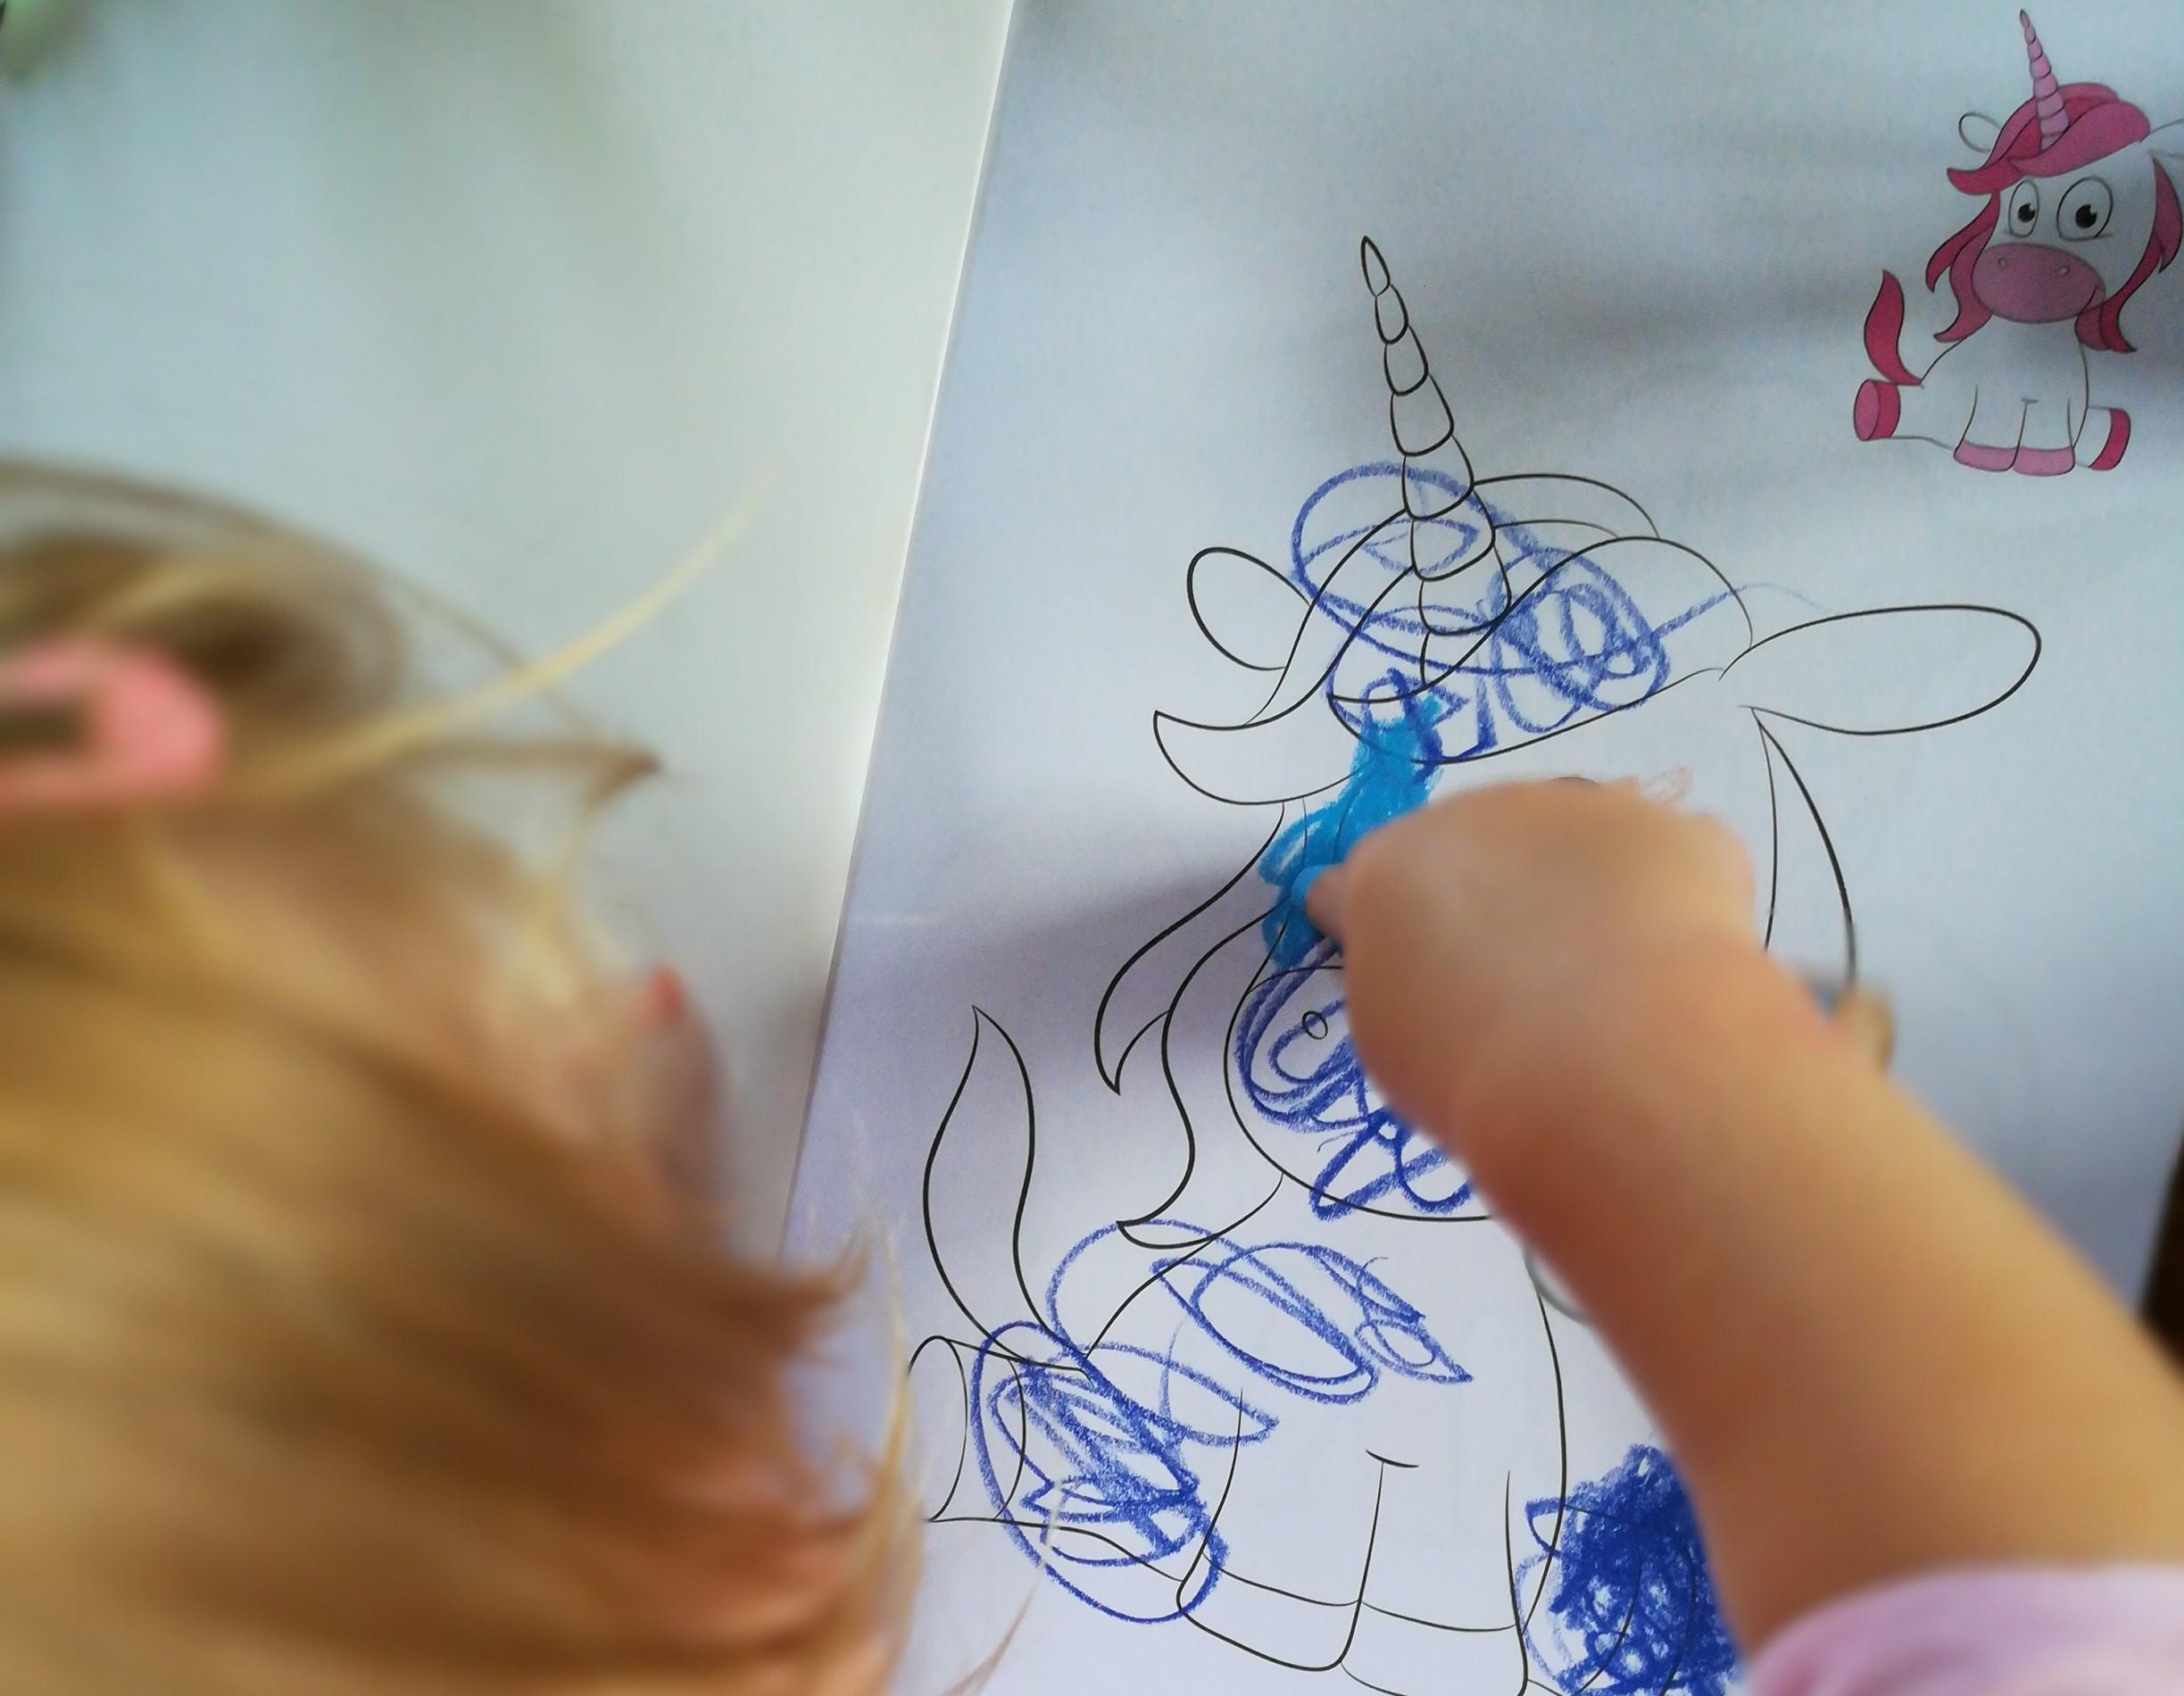 Greta malt im Malbuch